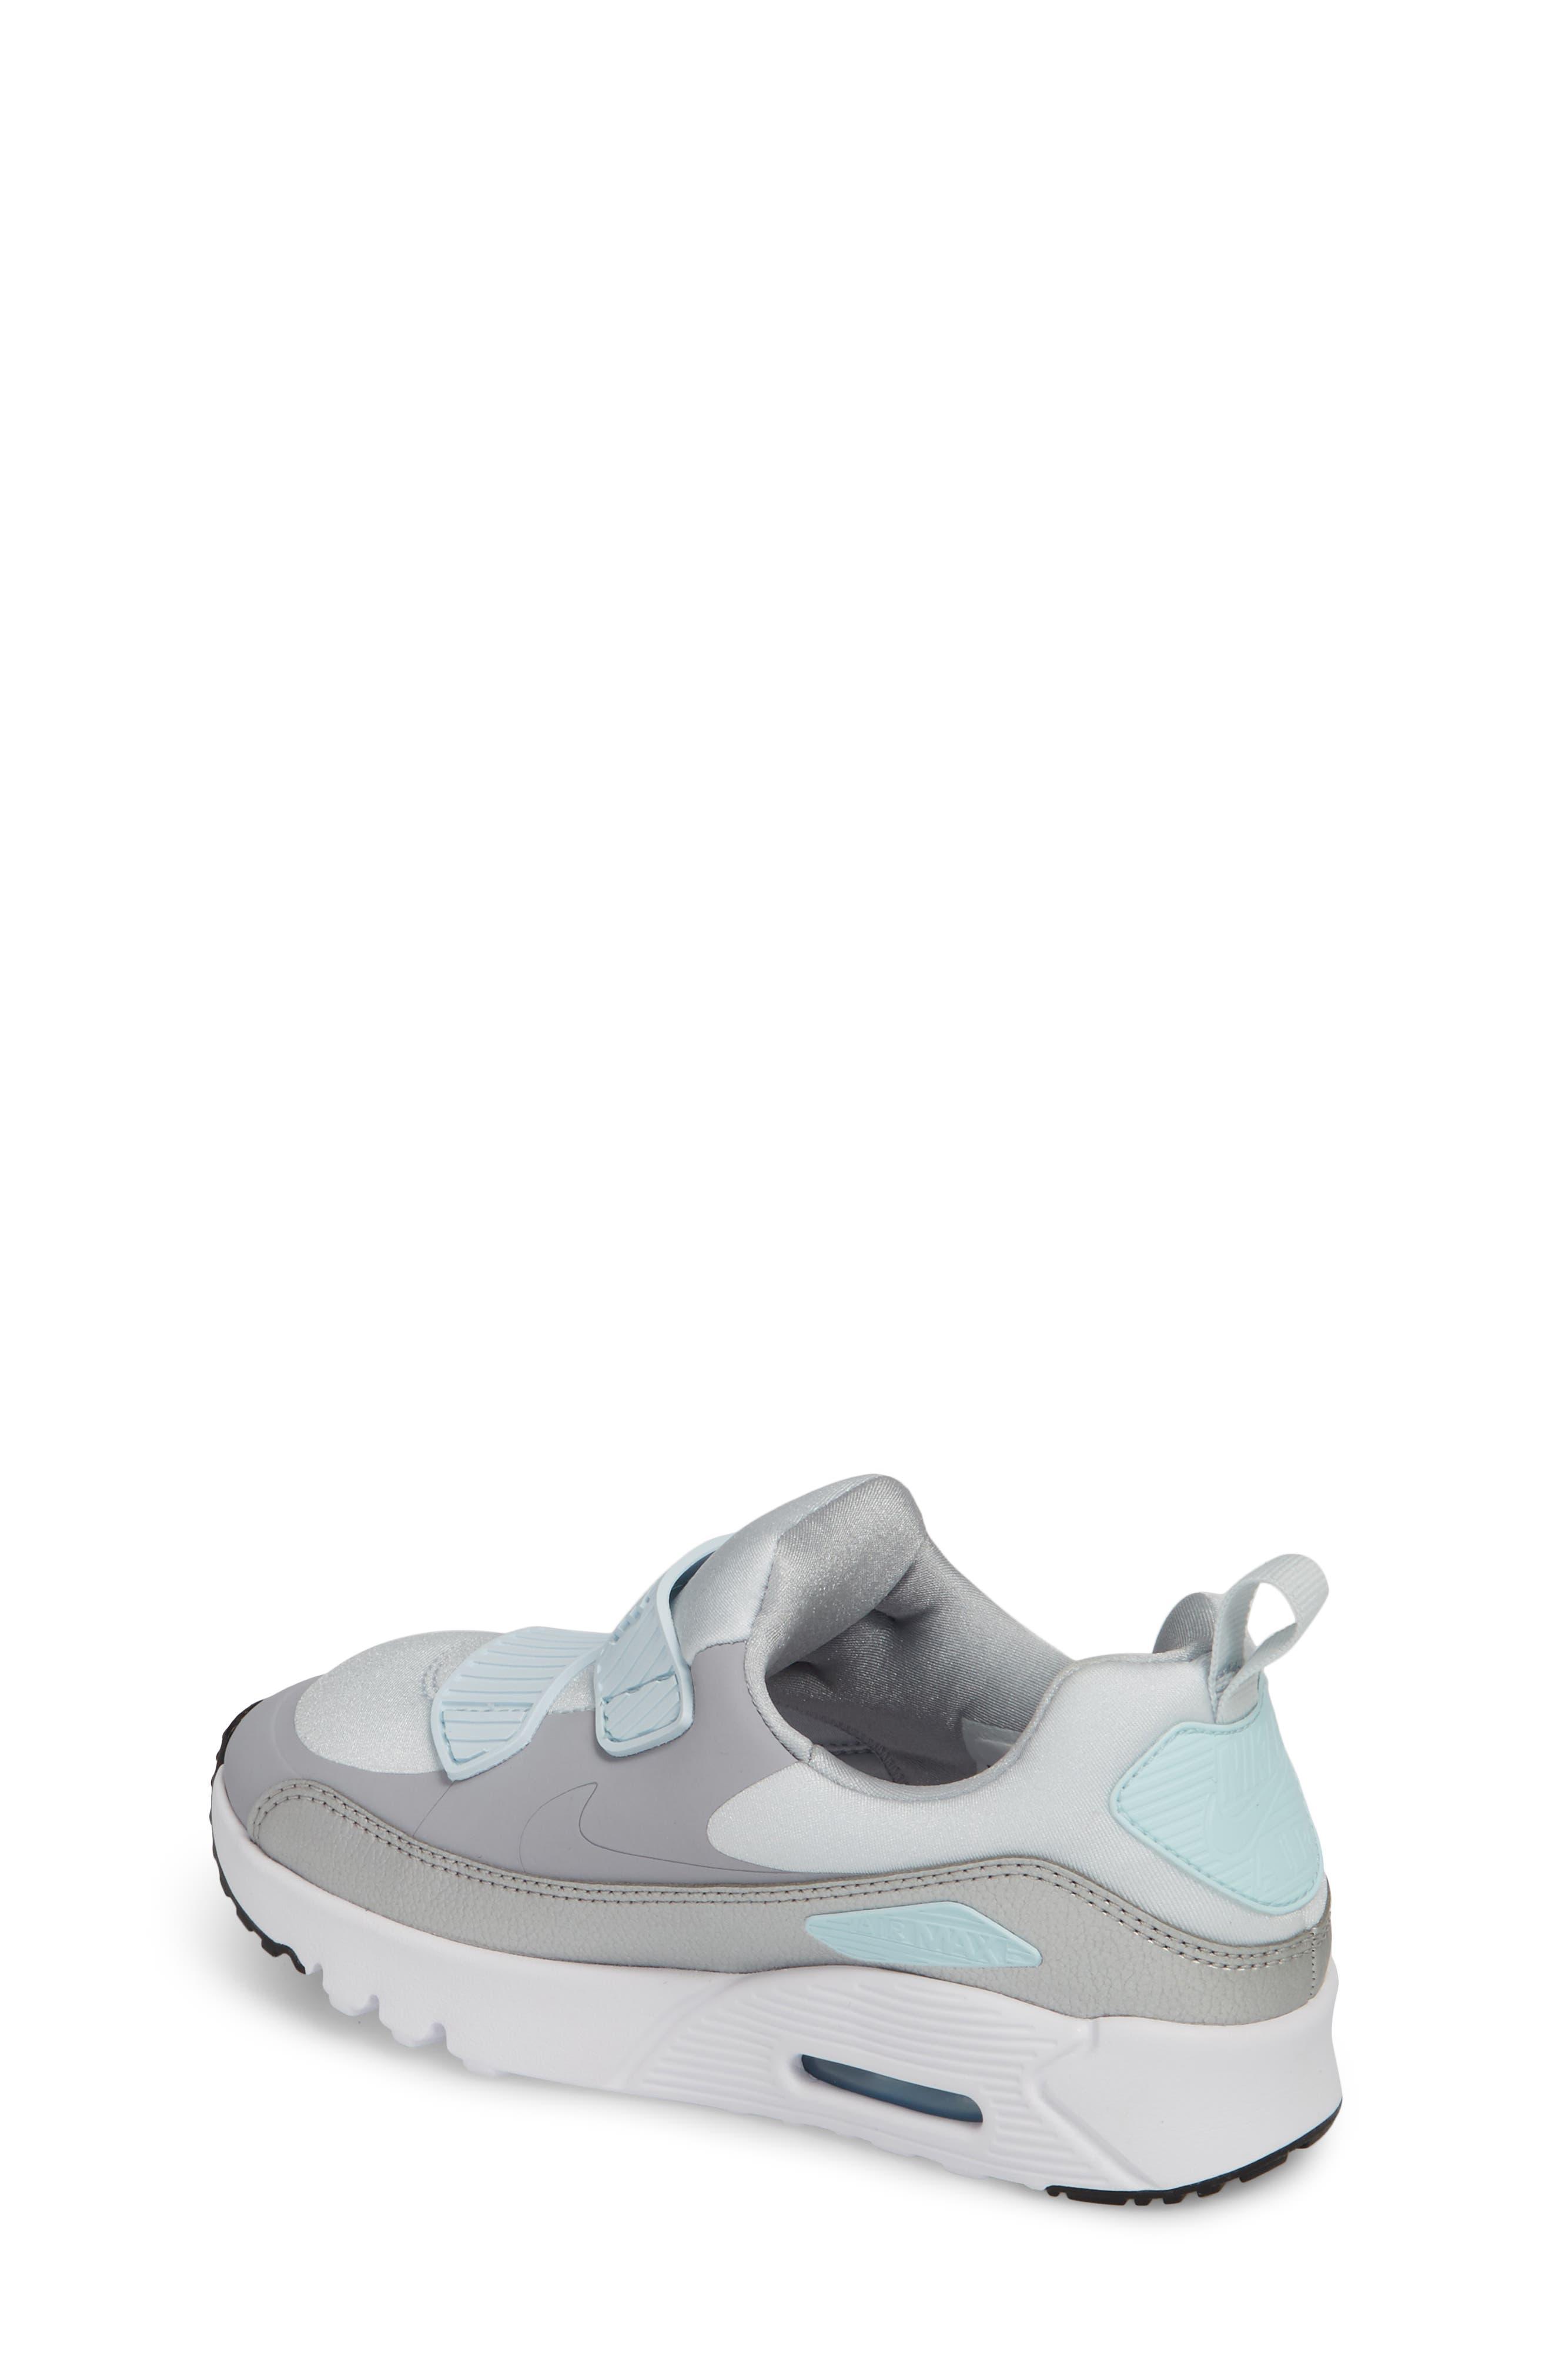 Air Max Tiny 90 Sneaker,                             Alternate thumbnail 2, color,                             Platinum/ Grey/ Silver